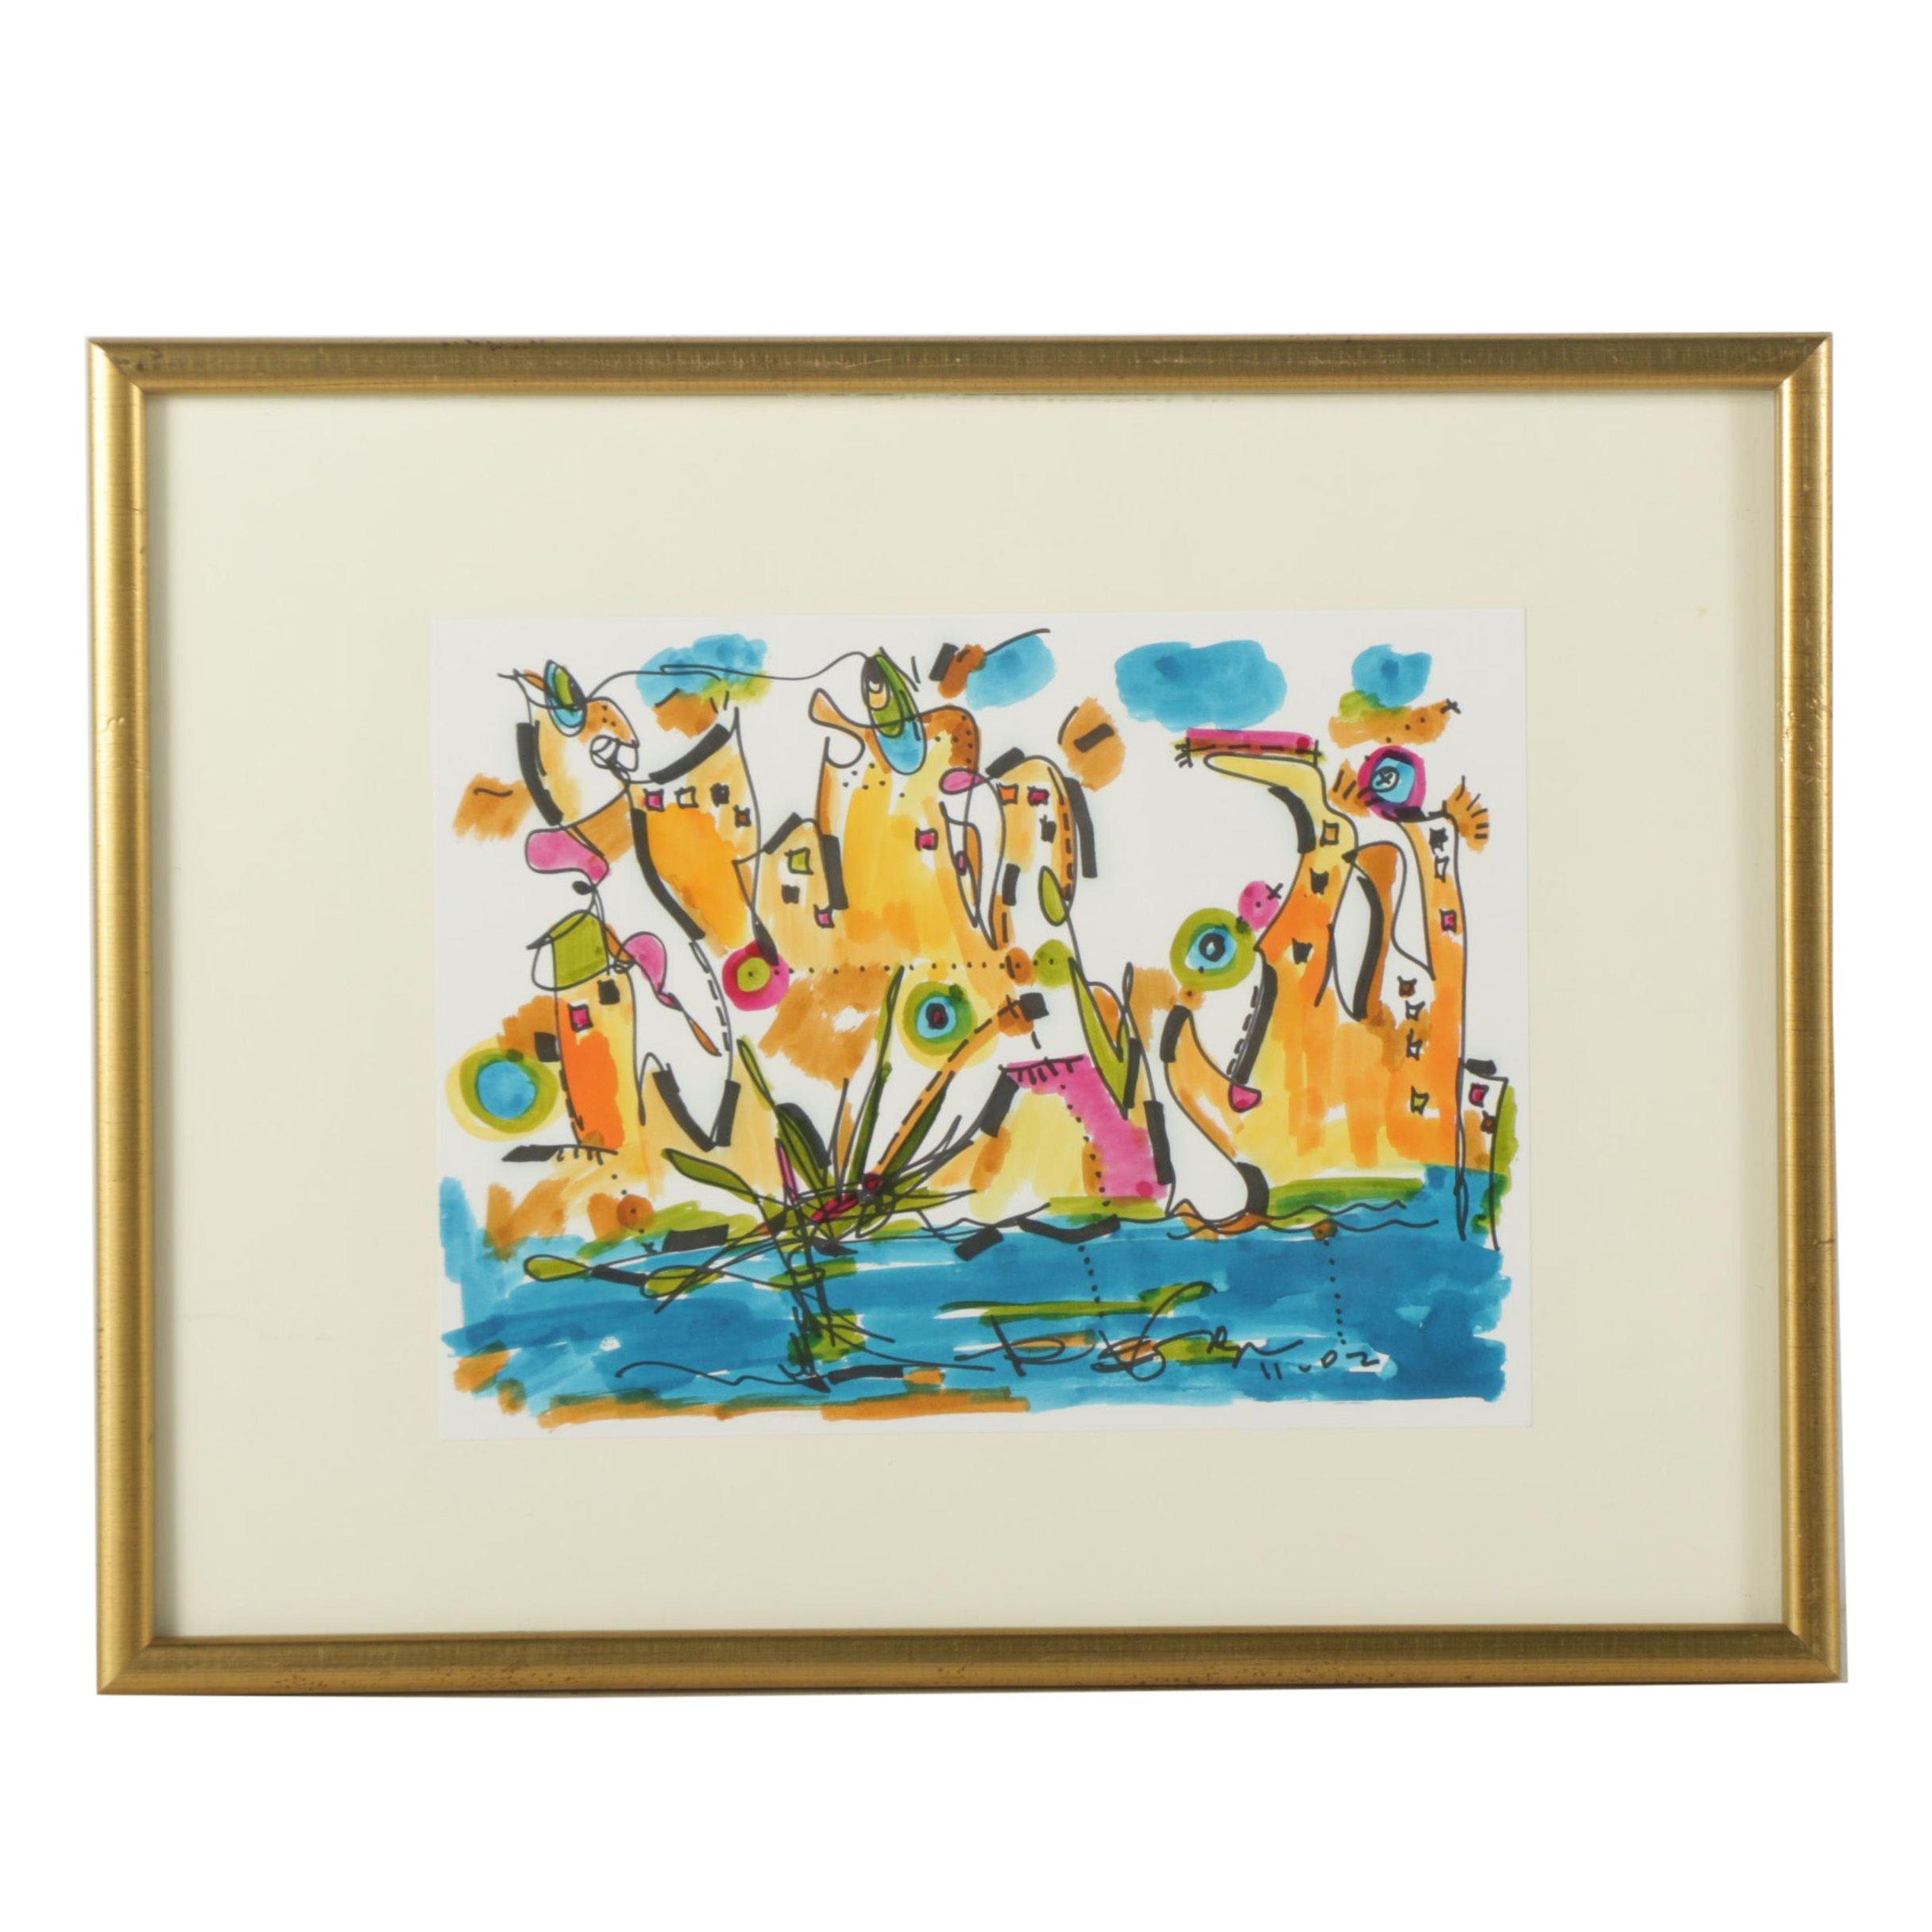 "Regia Marinho Watercolor Painting on Paper ""City River"""